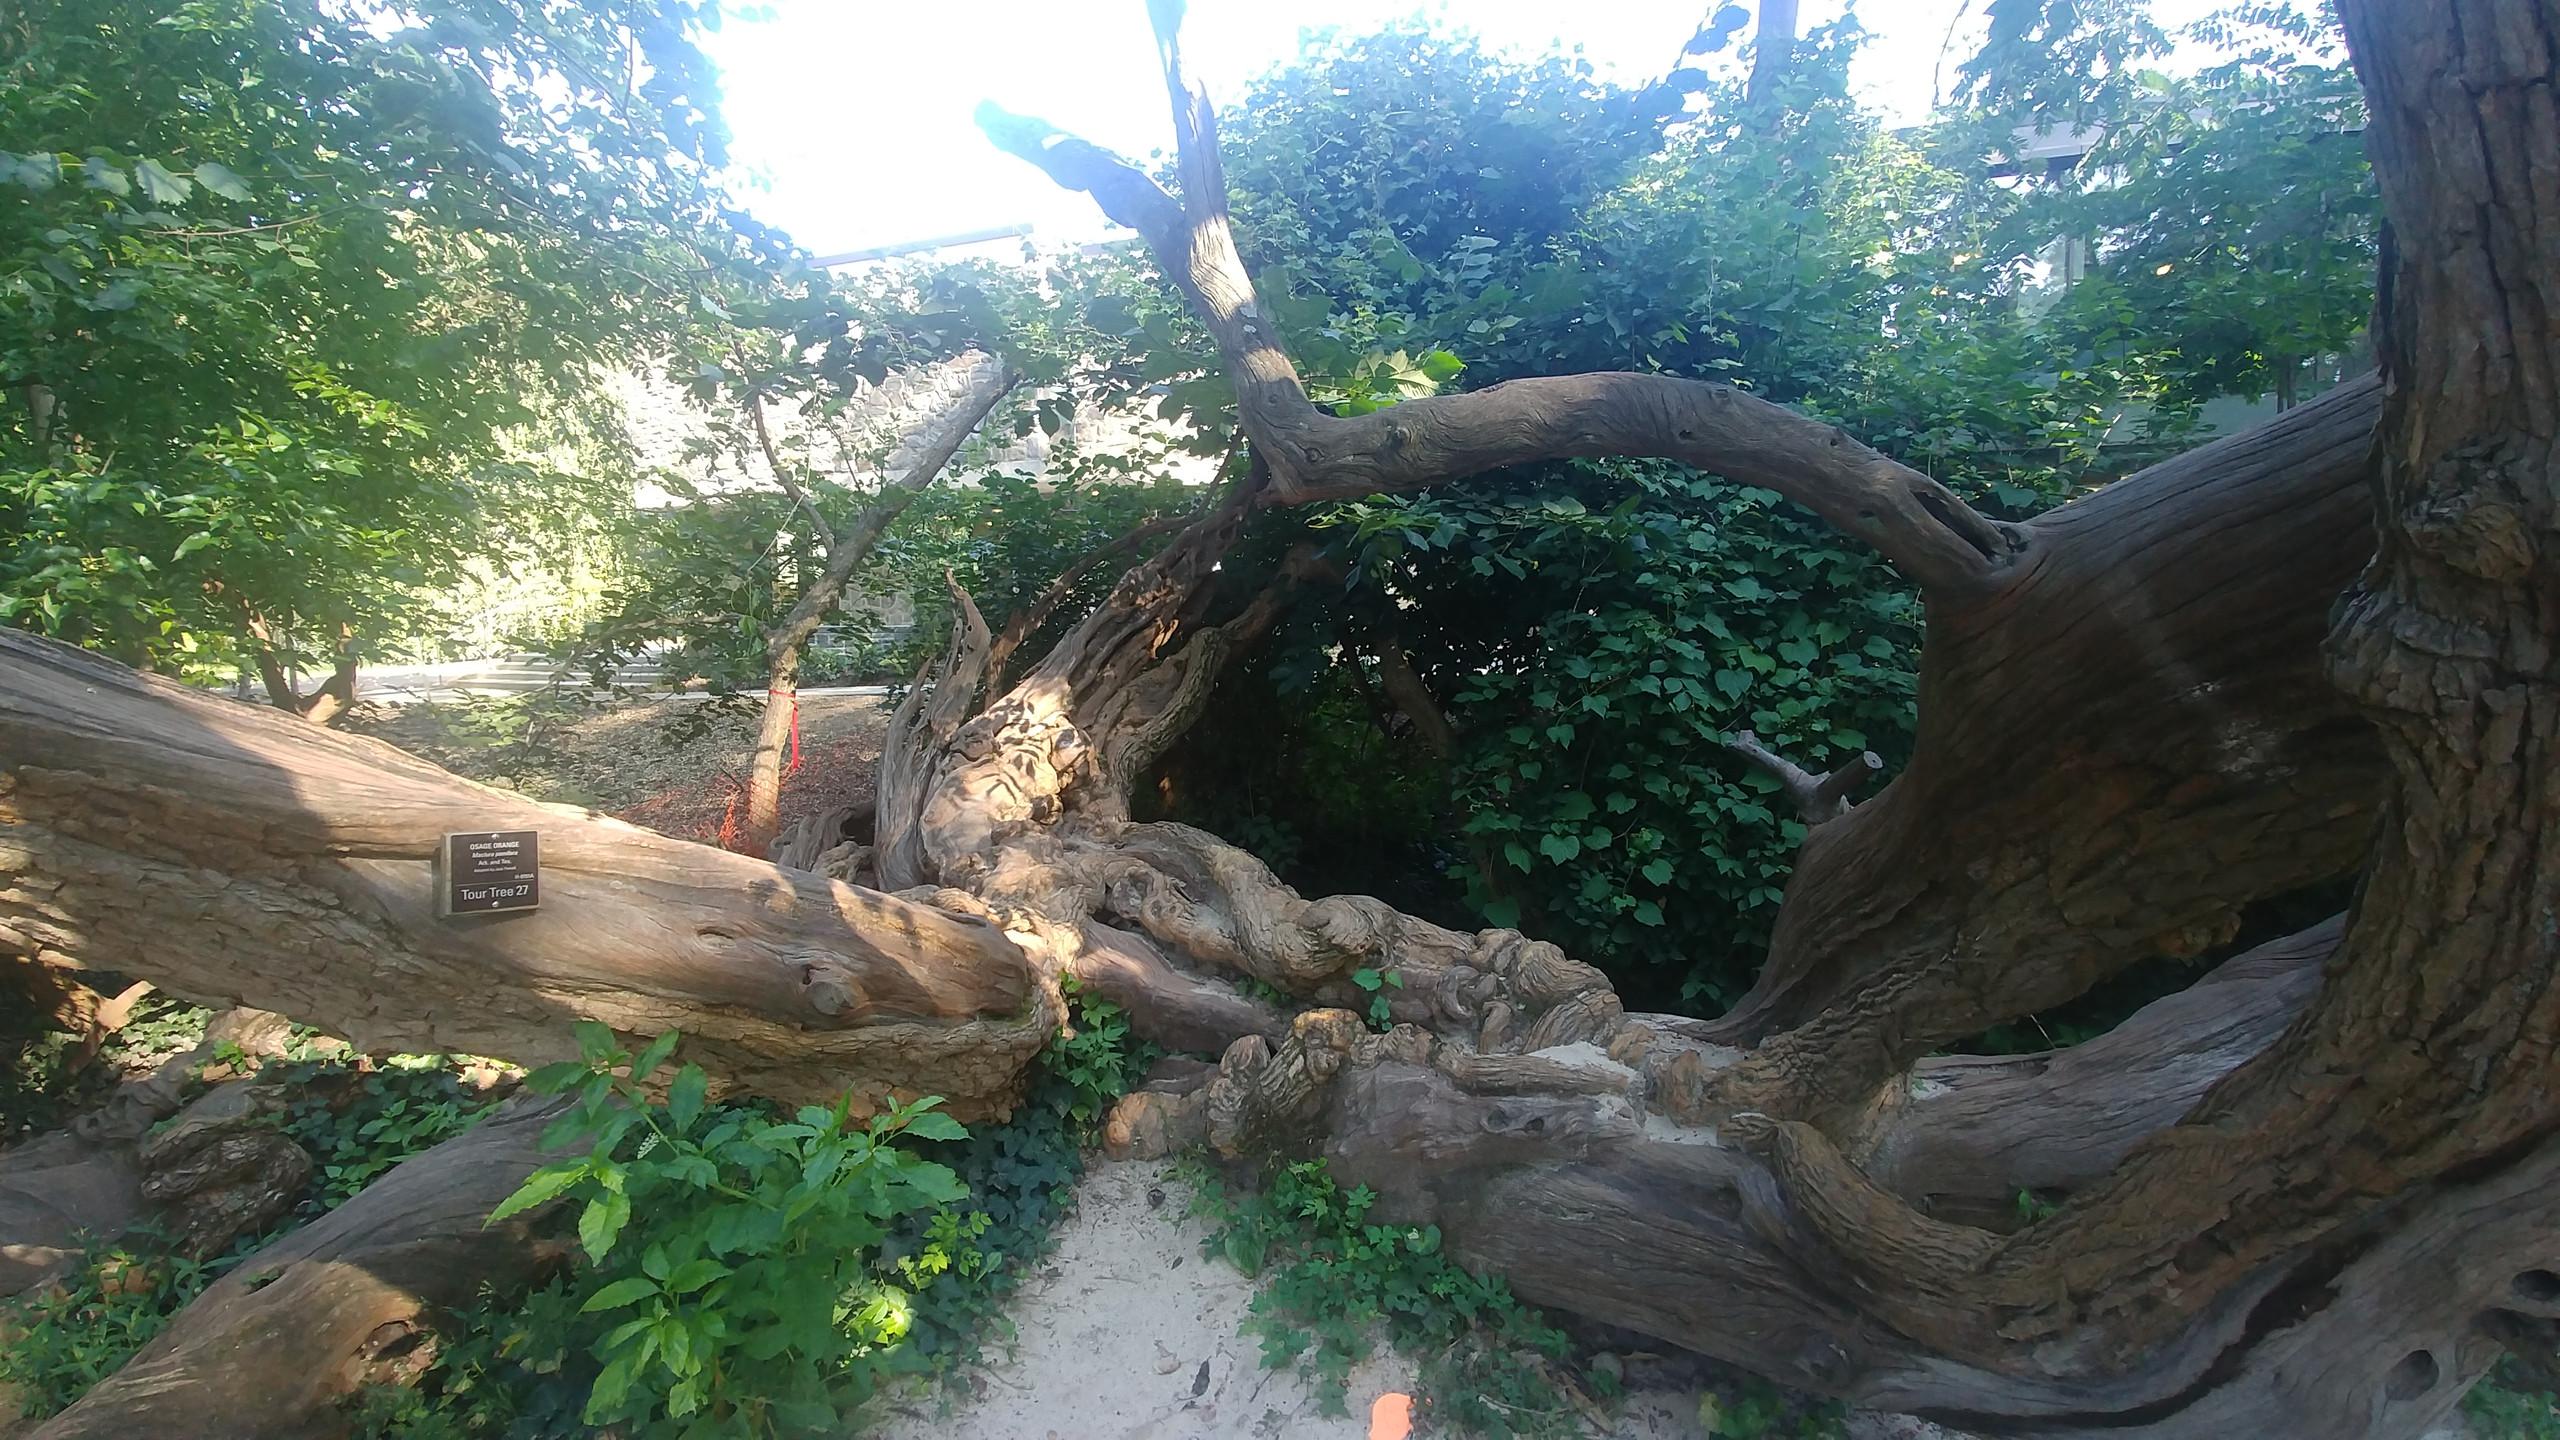 The osage orange tree from 1840